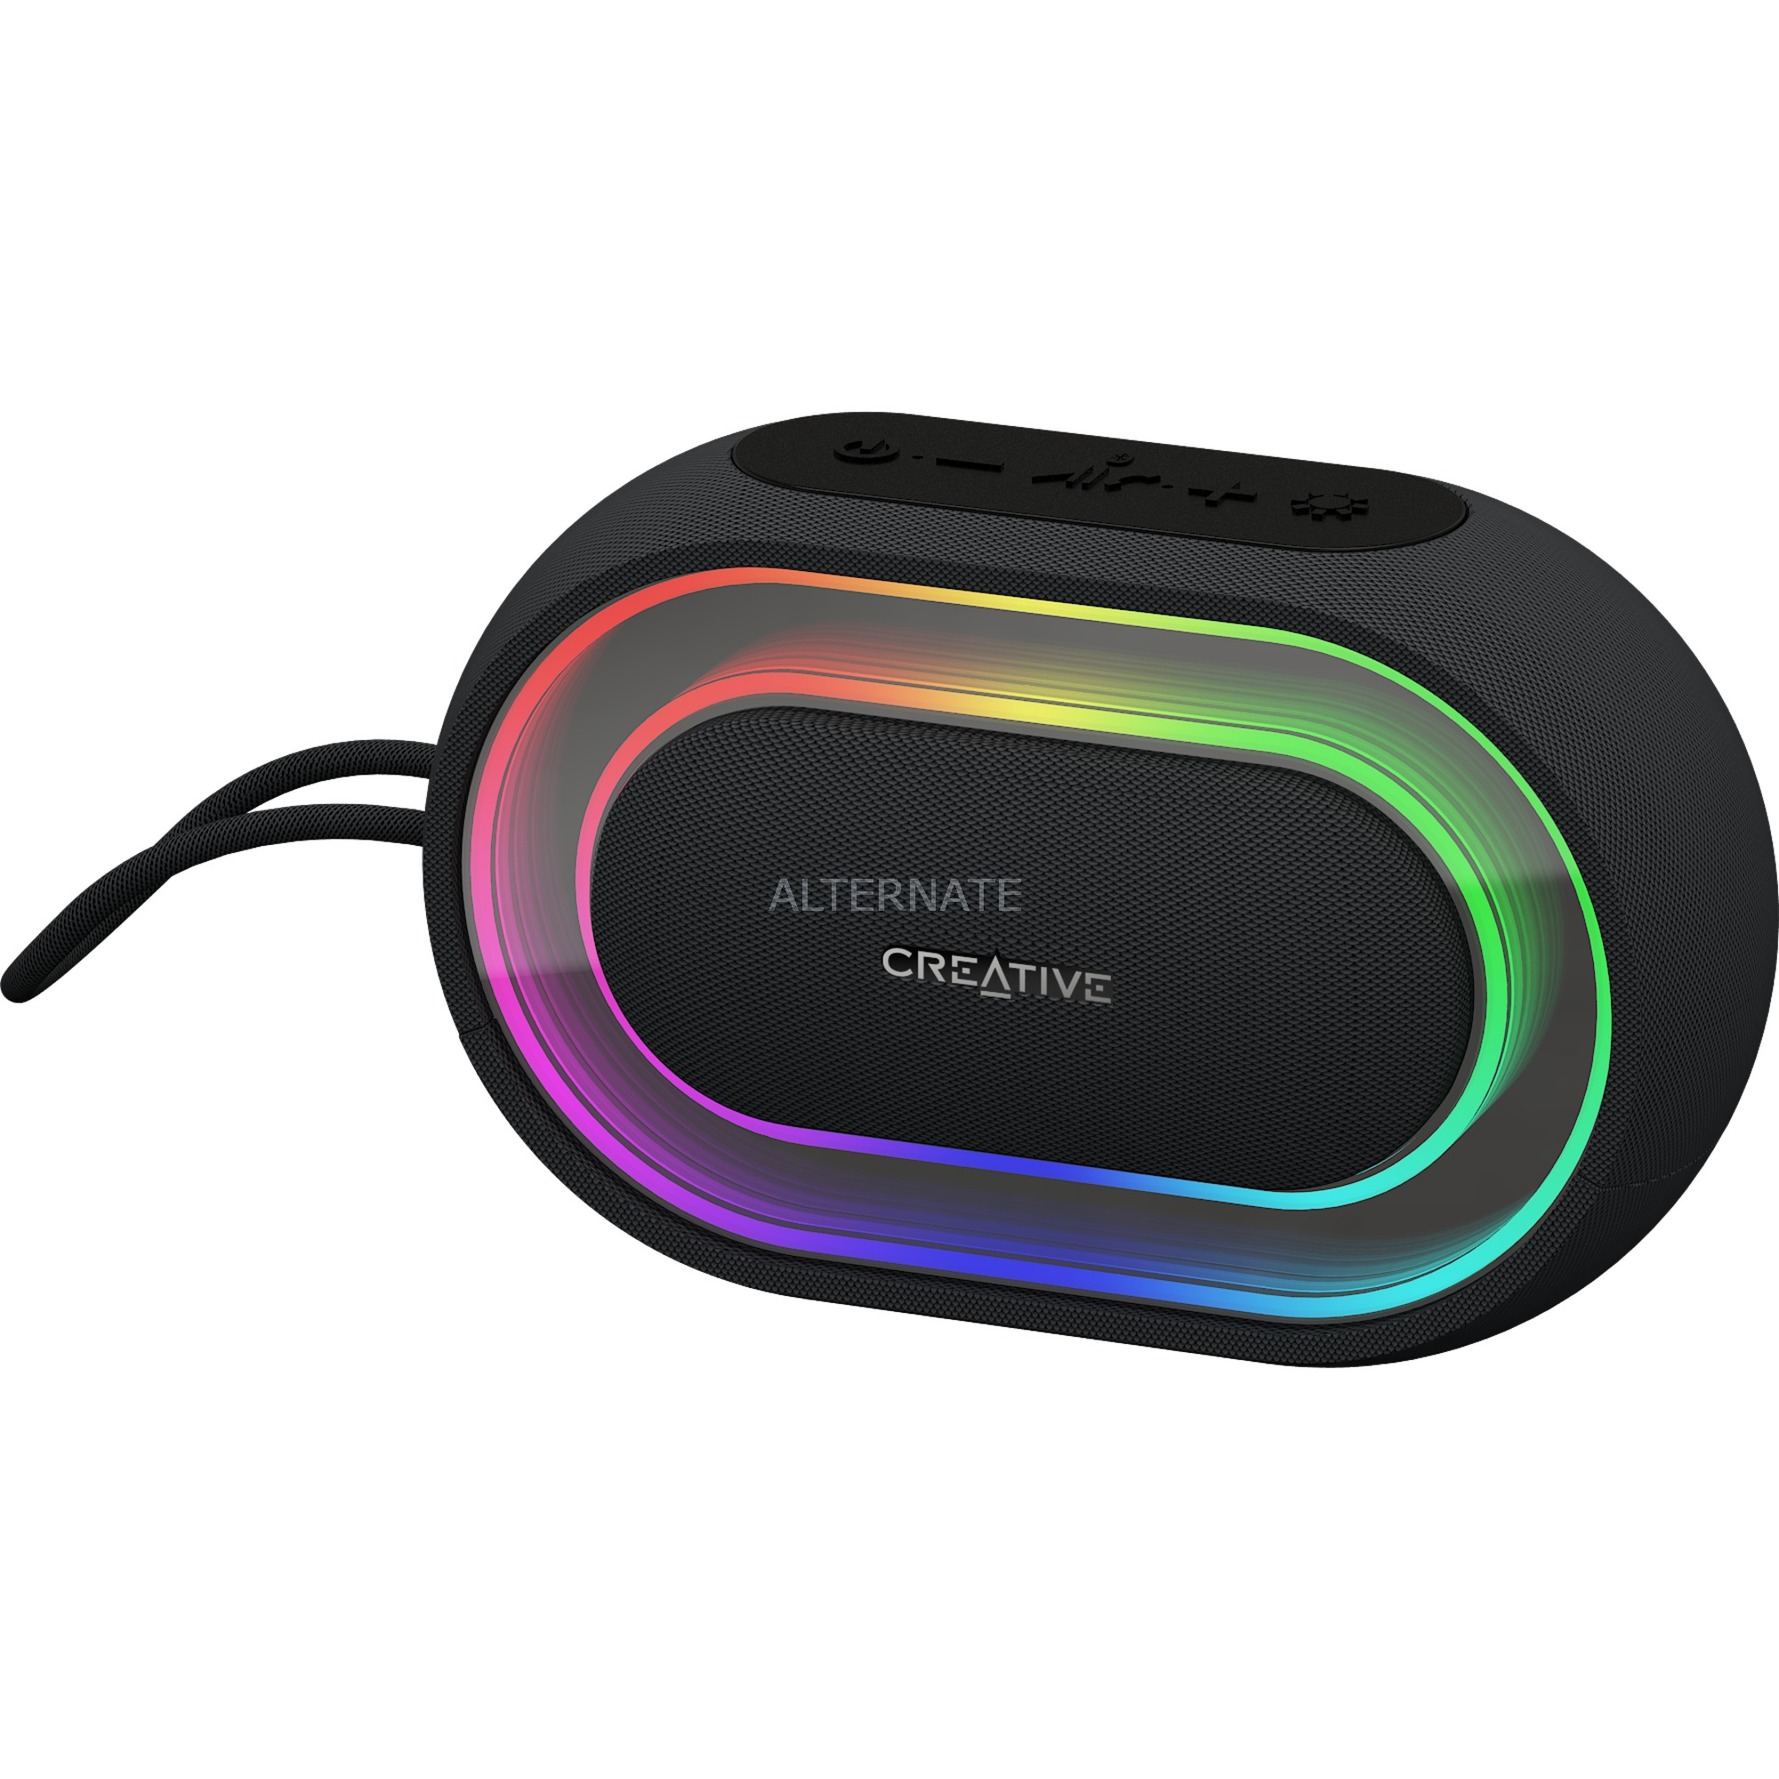 Halo Altavoz portátil estéreo Negro